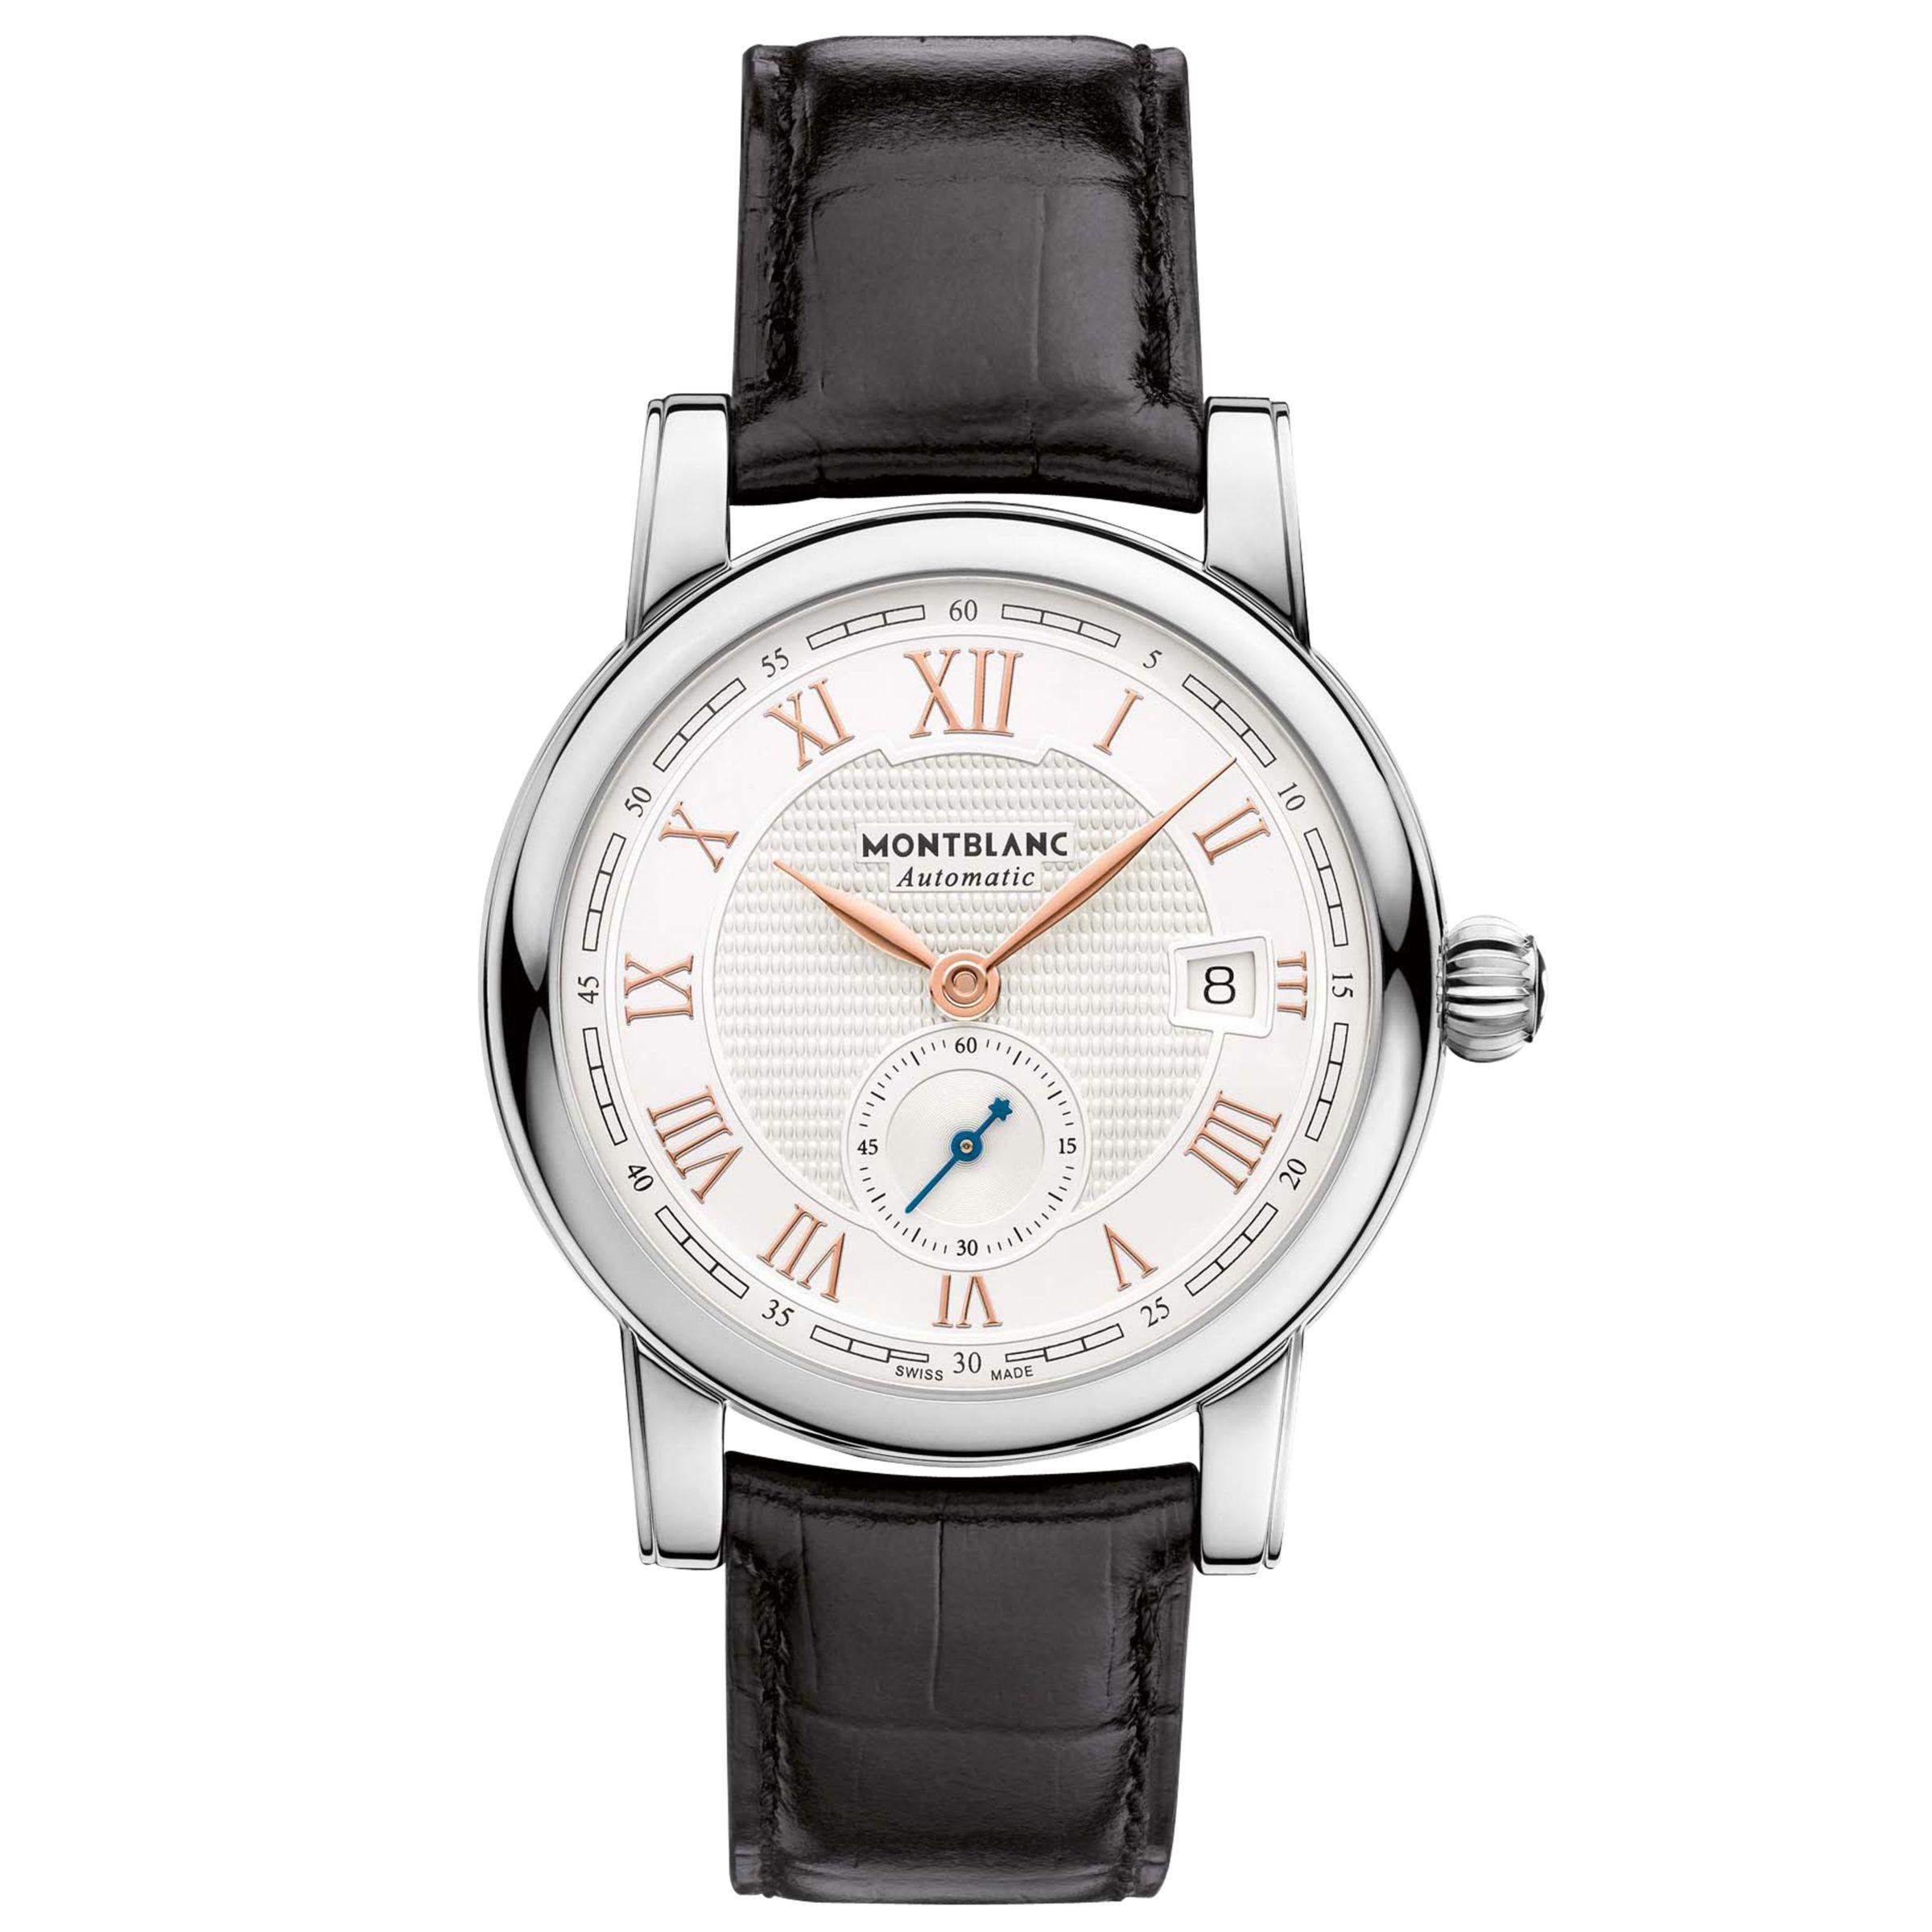 Montblanc Montblanc 113879 Men's Star Roman Small Second Carpe Diem Date Special Edition Leather Strap Watch, Black/White